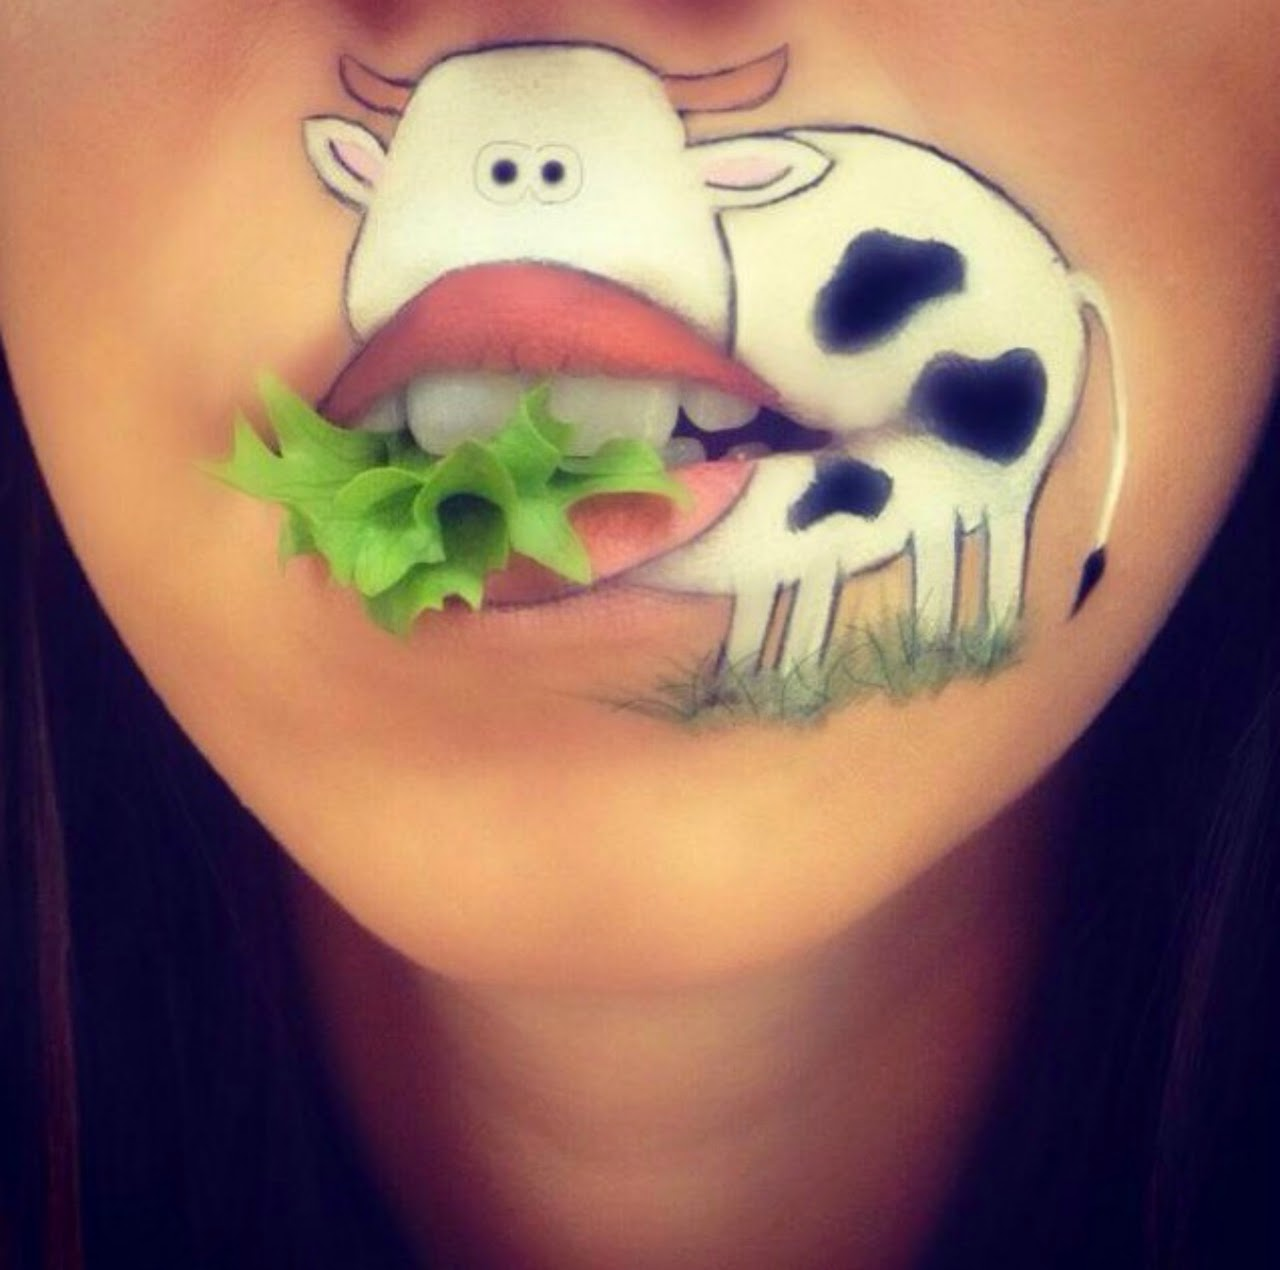 Amazing Cartoon Lip-Art By Laura Jenkinson 25